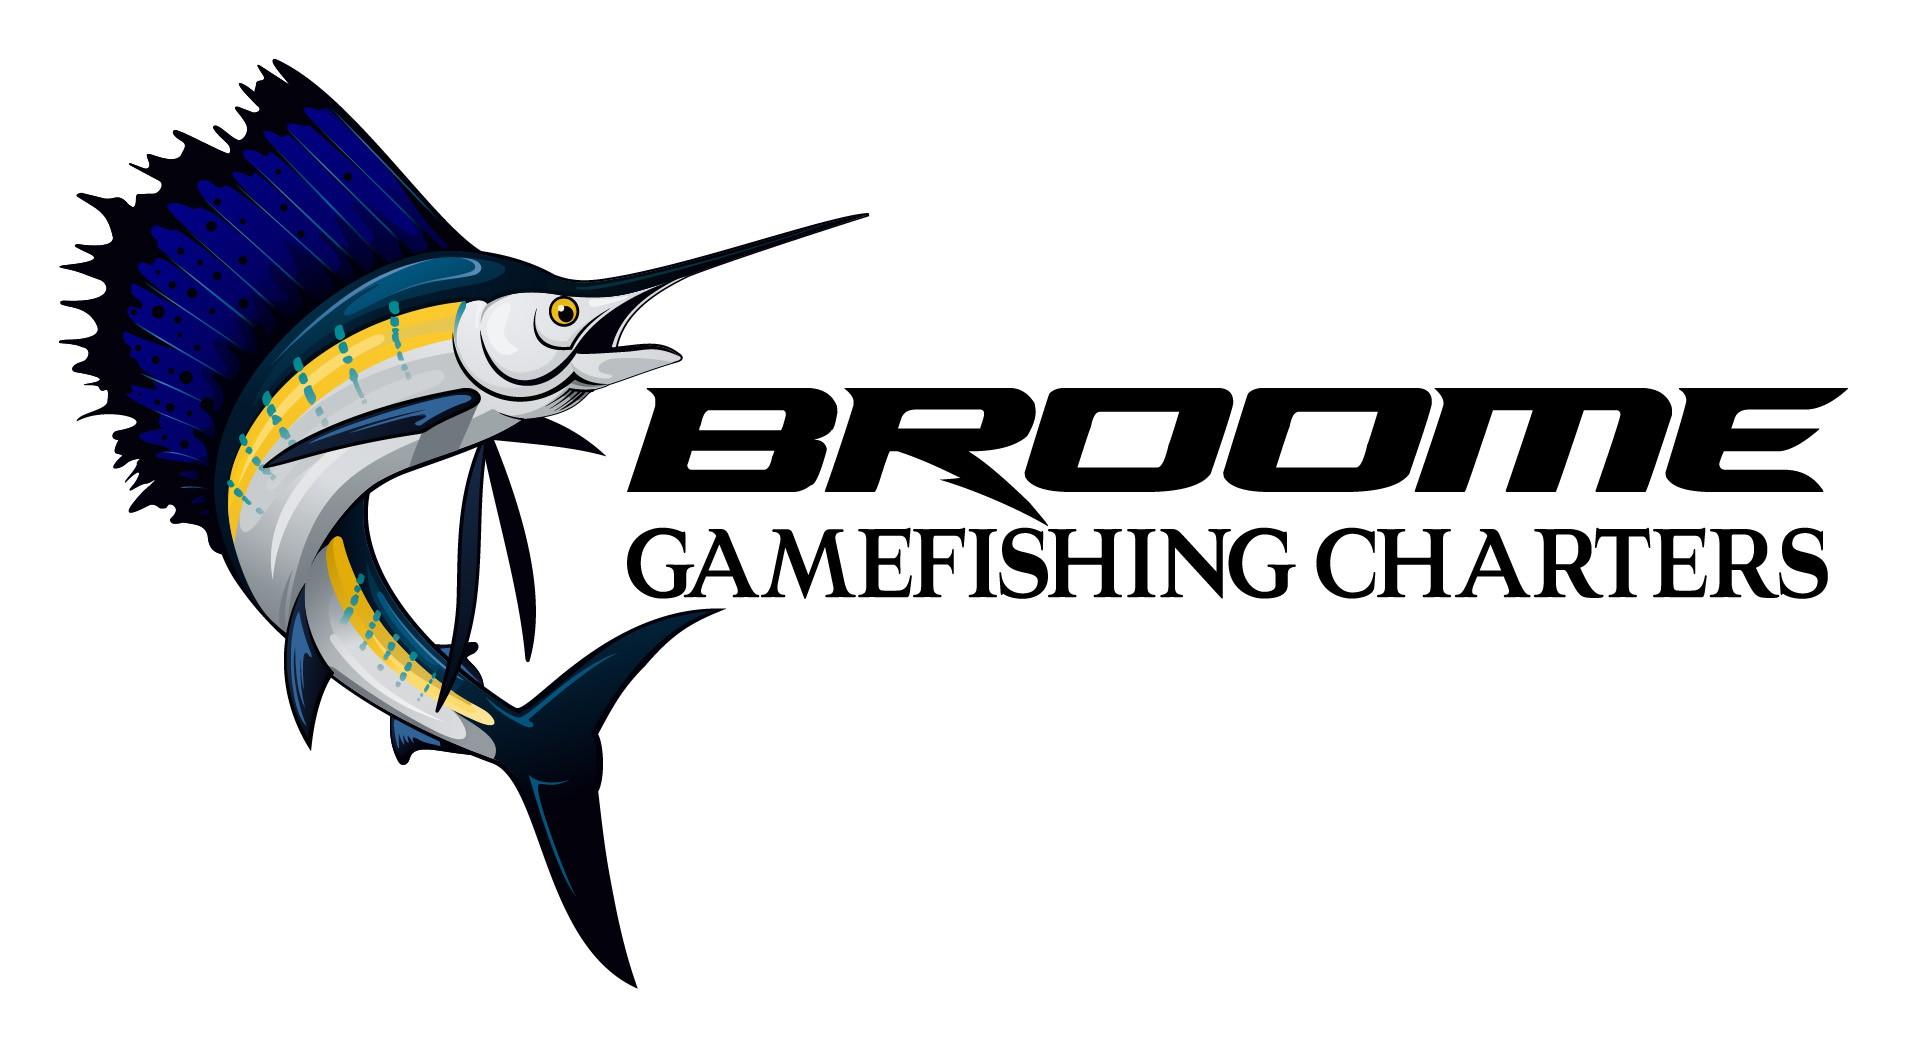 Gamefishing  charter business needs a new cutting edge logo/brand